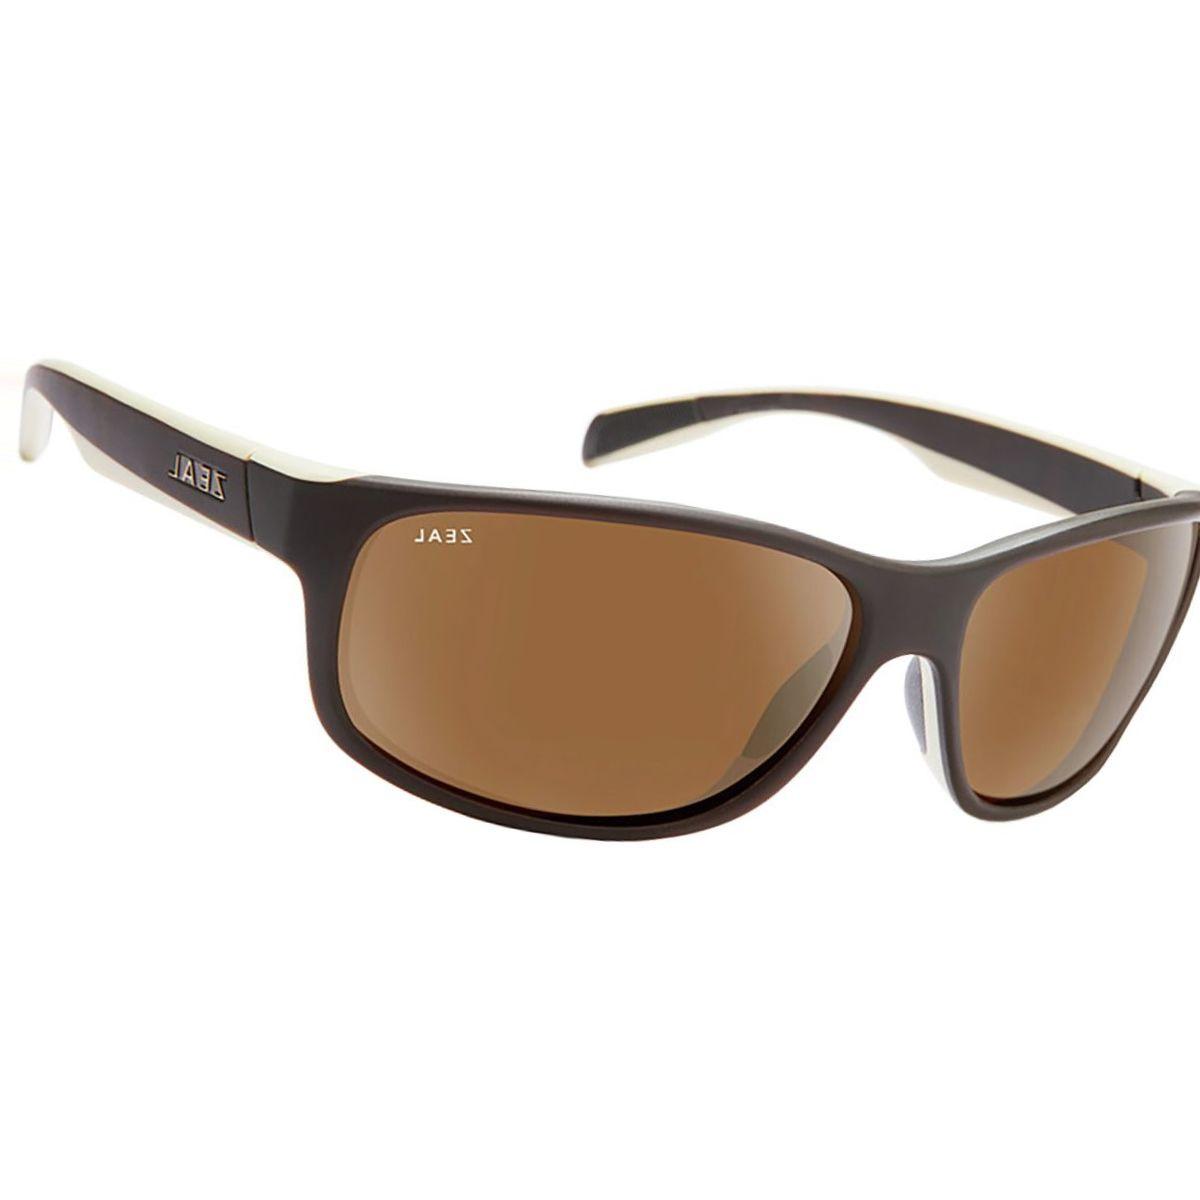 Zeal Sable Polarized Sunglasses - Women's